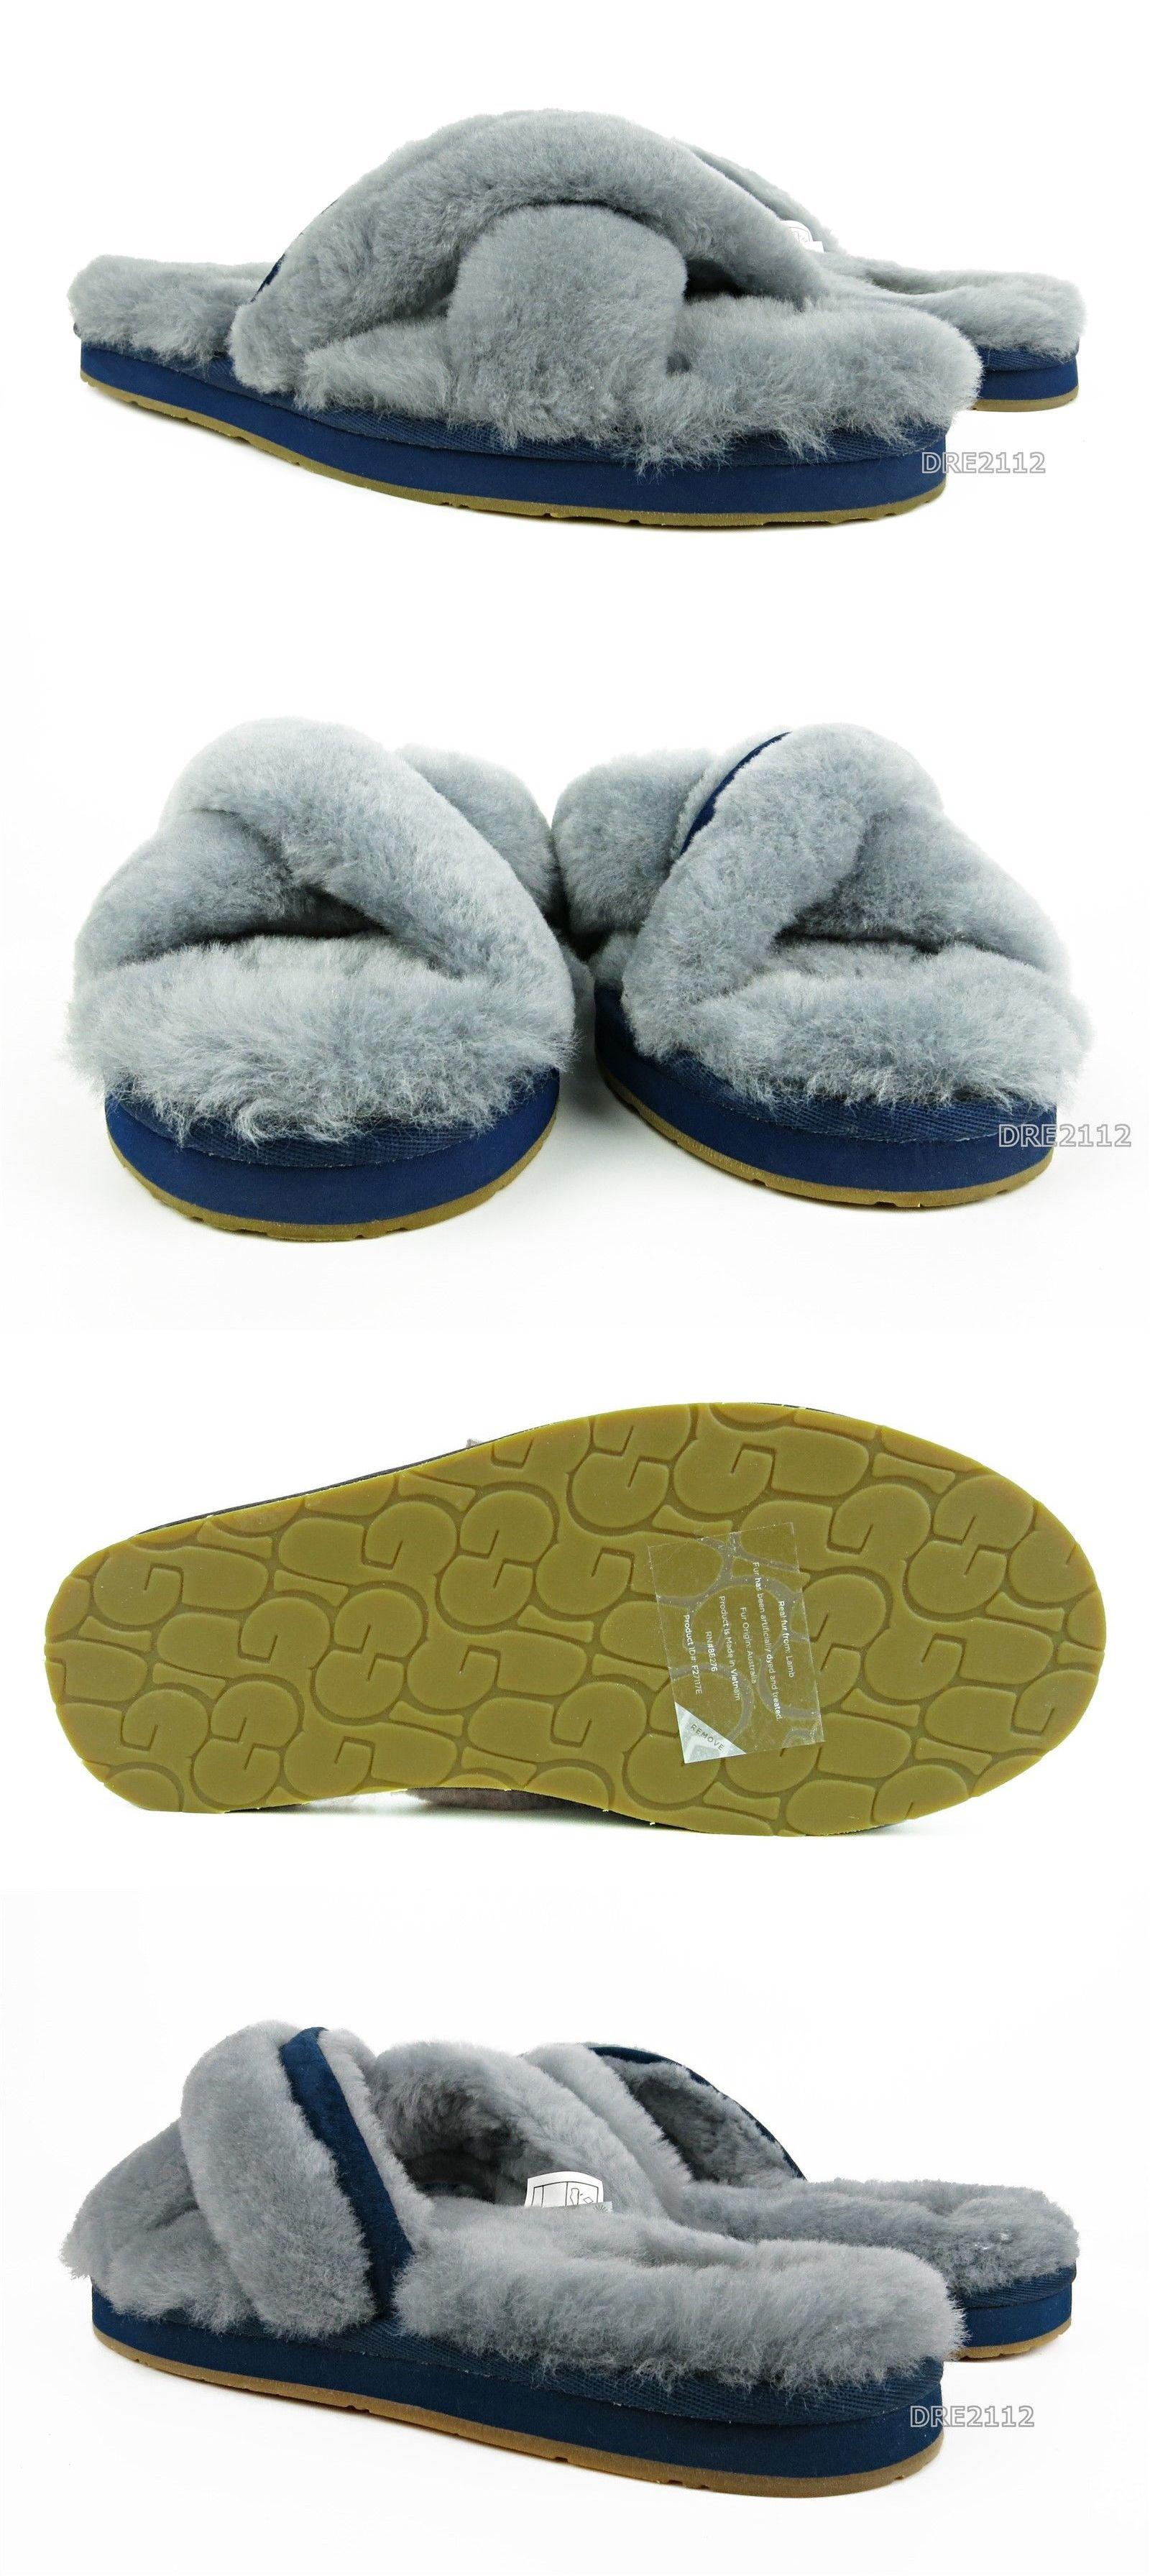 39bb77f5024 Slippers 11632: Ugg Abela Geyser Grey Blue Suede Fur Slippers Womens ...